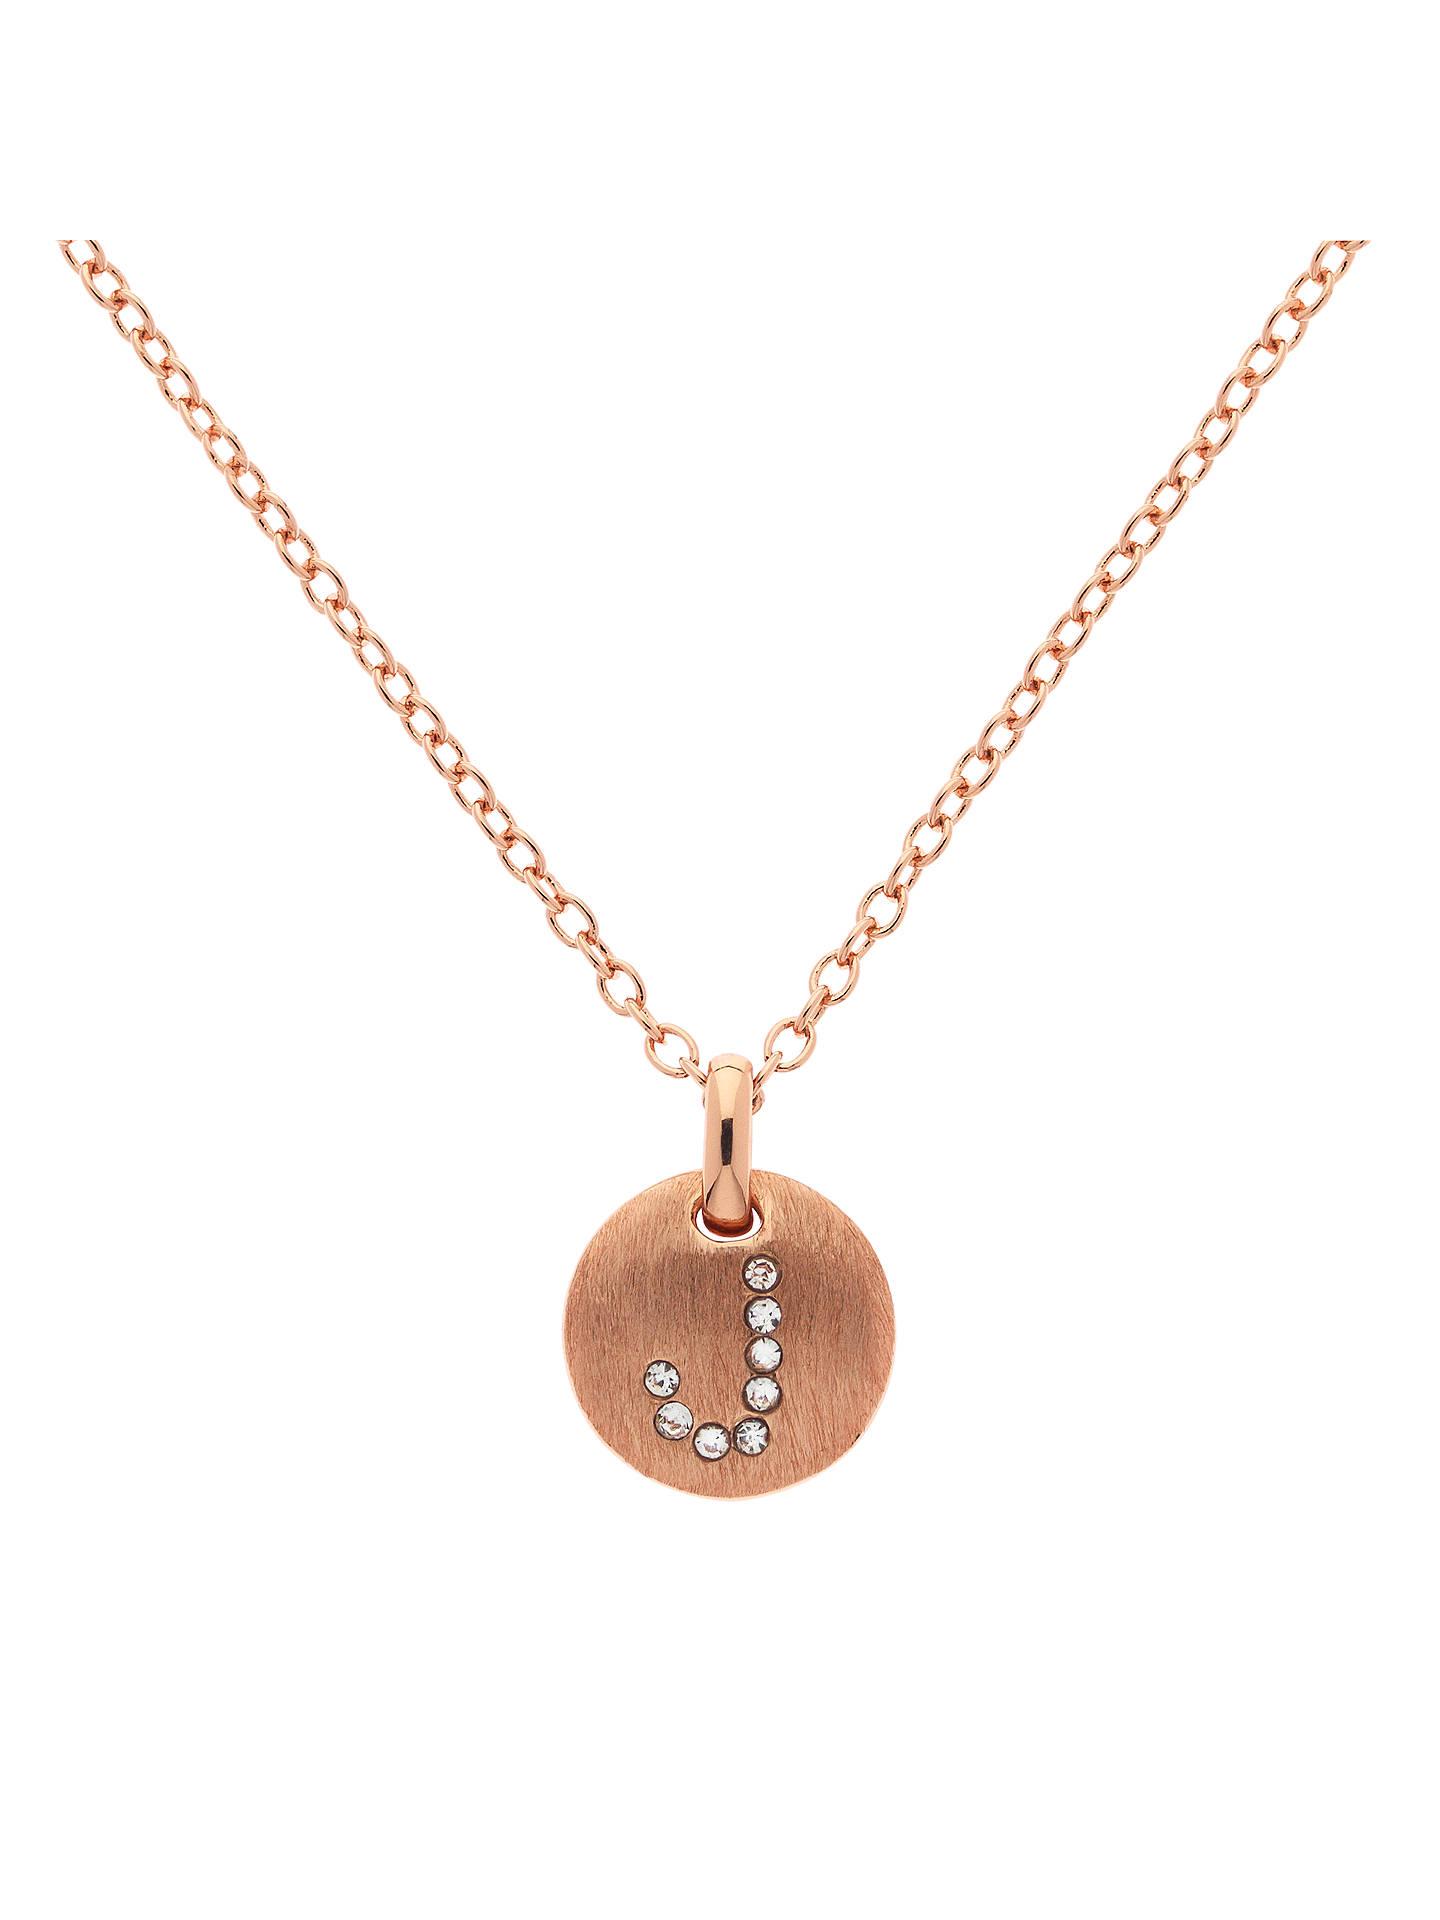 95f722e79ac04 Melissa Odabash Rose Gold Plated Crystal Letter Pendant at John ...